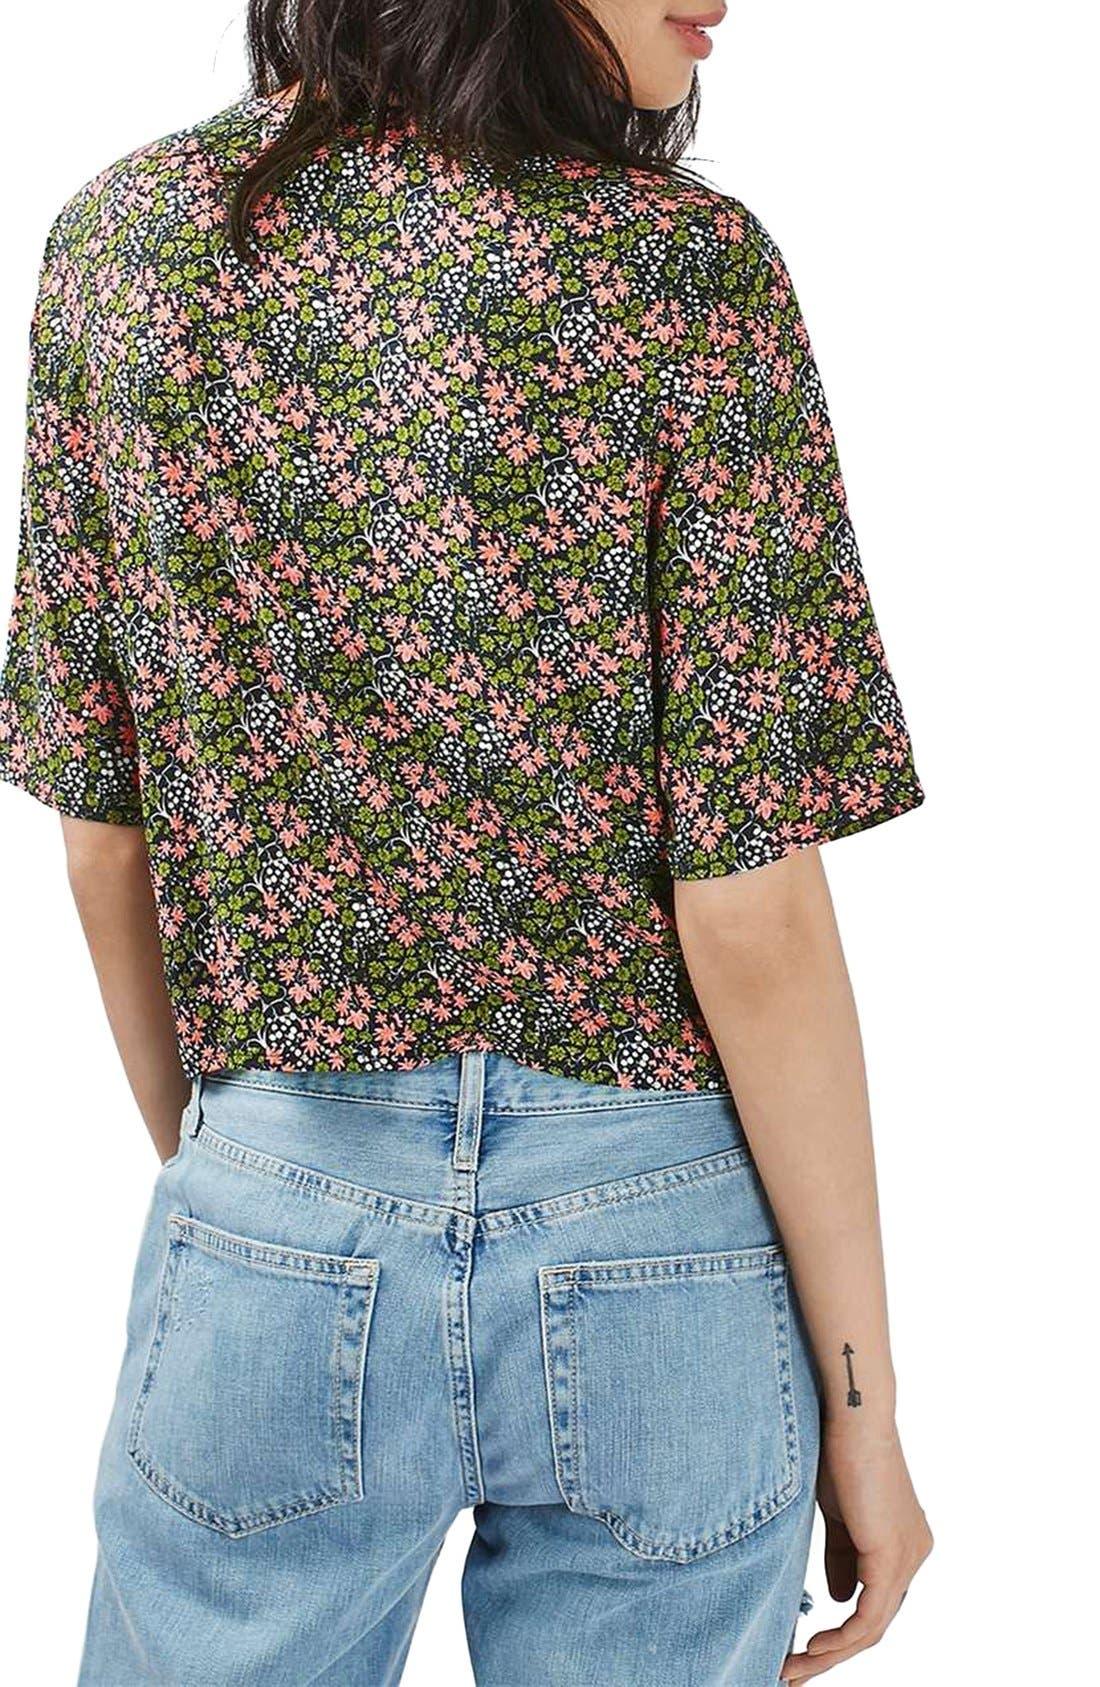 Alternate Image 3  - Topshop 'Holly' Ditsy Floral Print Shirt